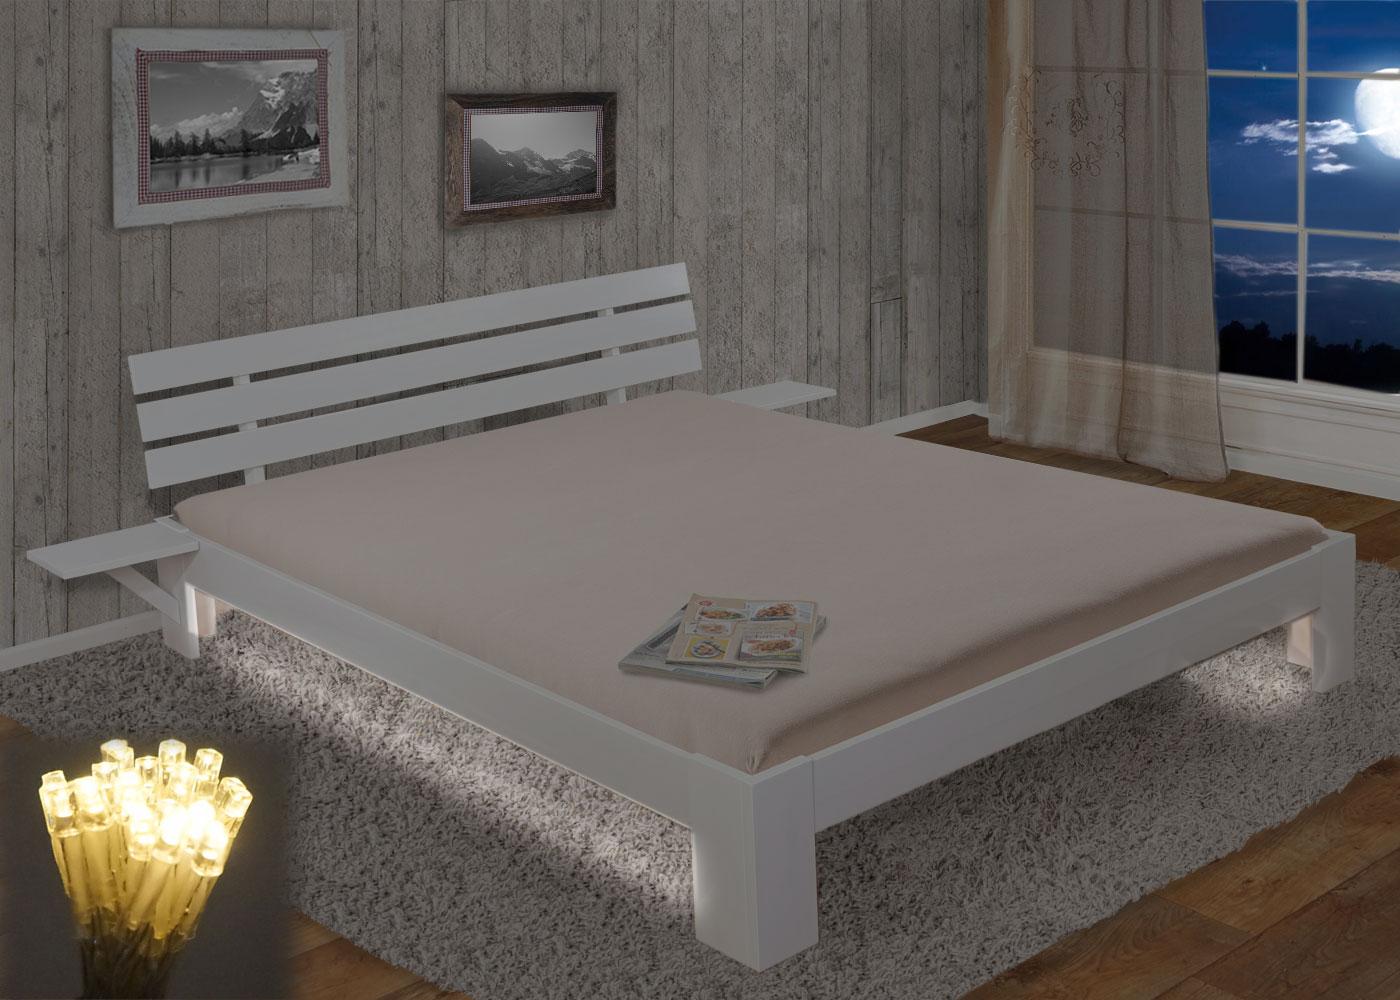 Full Size of 2m X Bett Perth Mit Hohem Kopfteil Modernes 180x200 Coole Betten Clinique Even Better Foundation 90x200 Komplett Lattenrost Und Matratze Günstig Massiv Flexa Bett 2m X 2m Bett